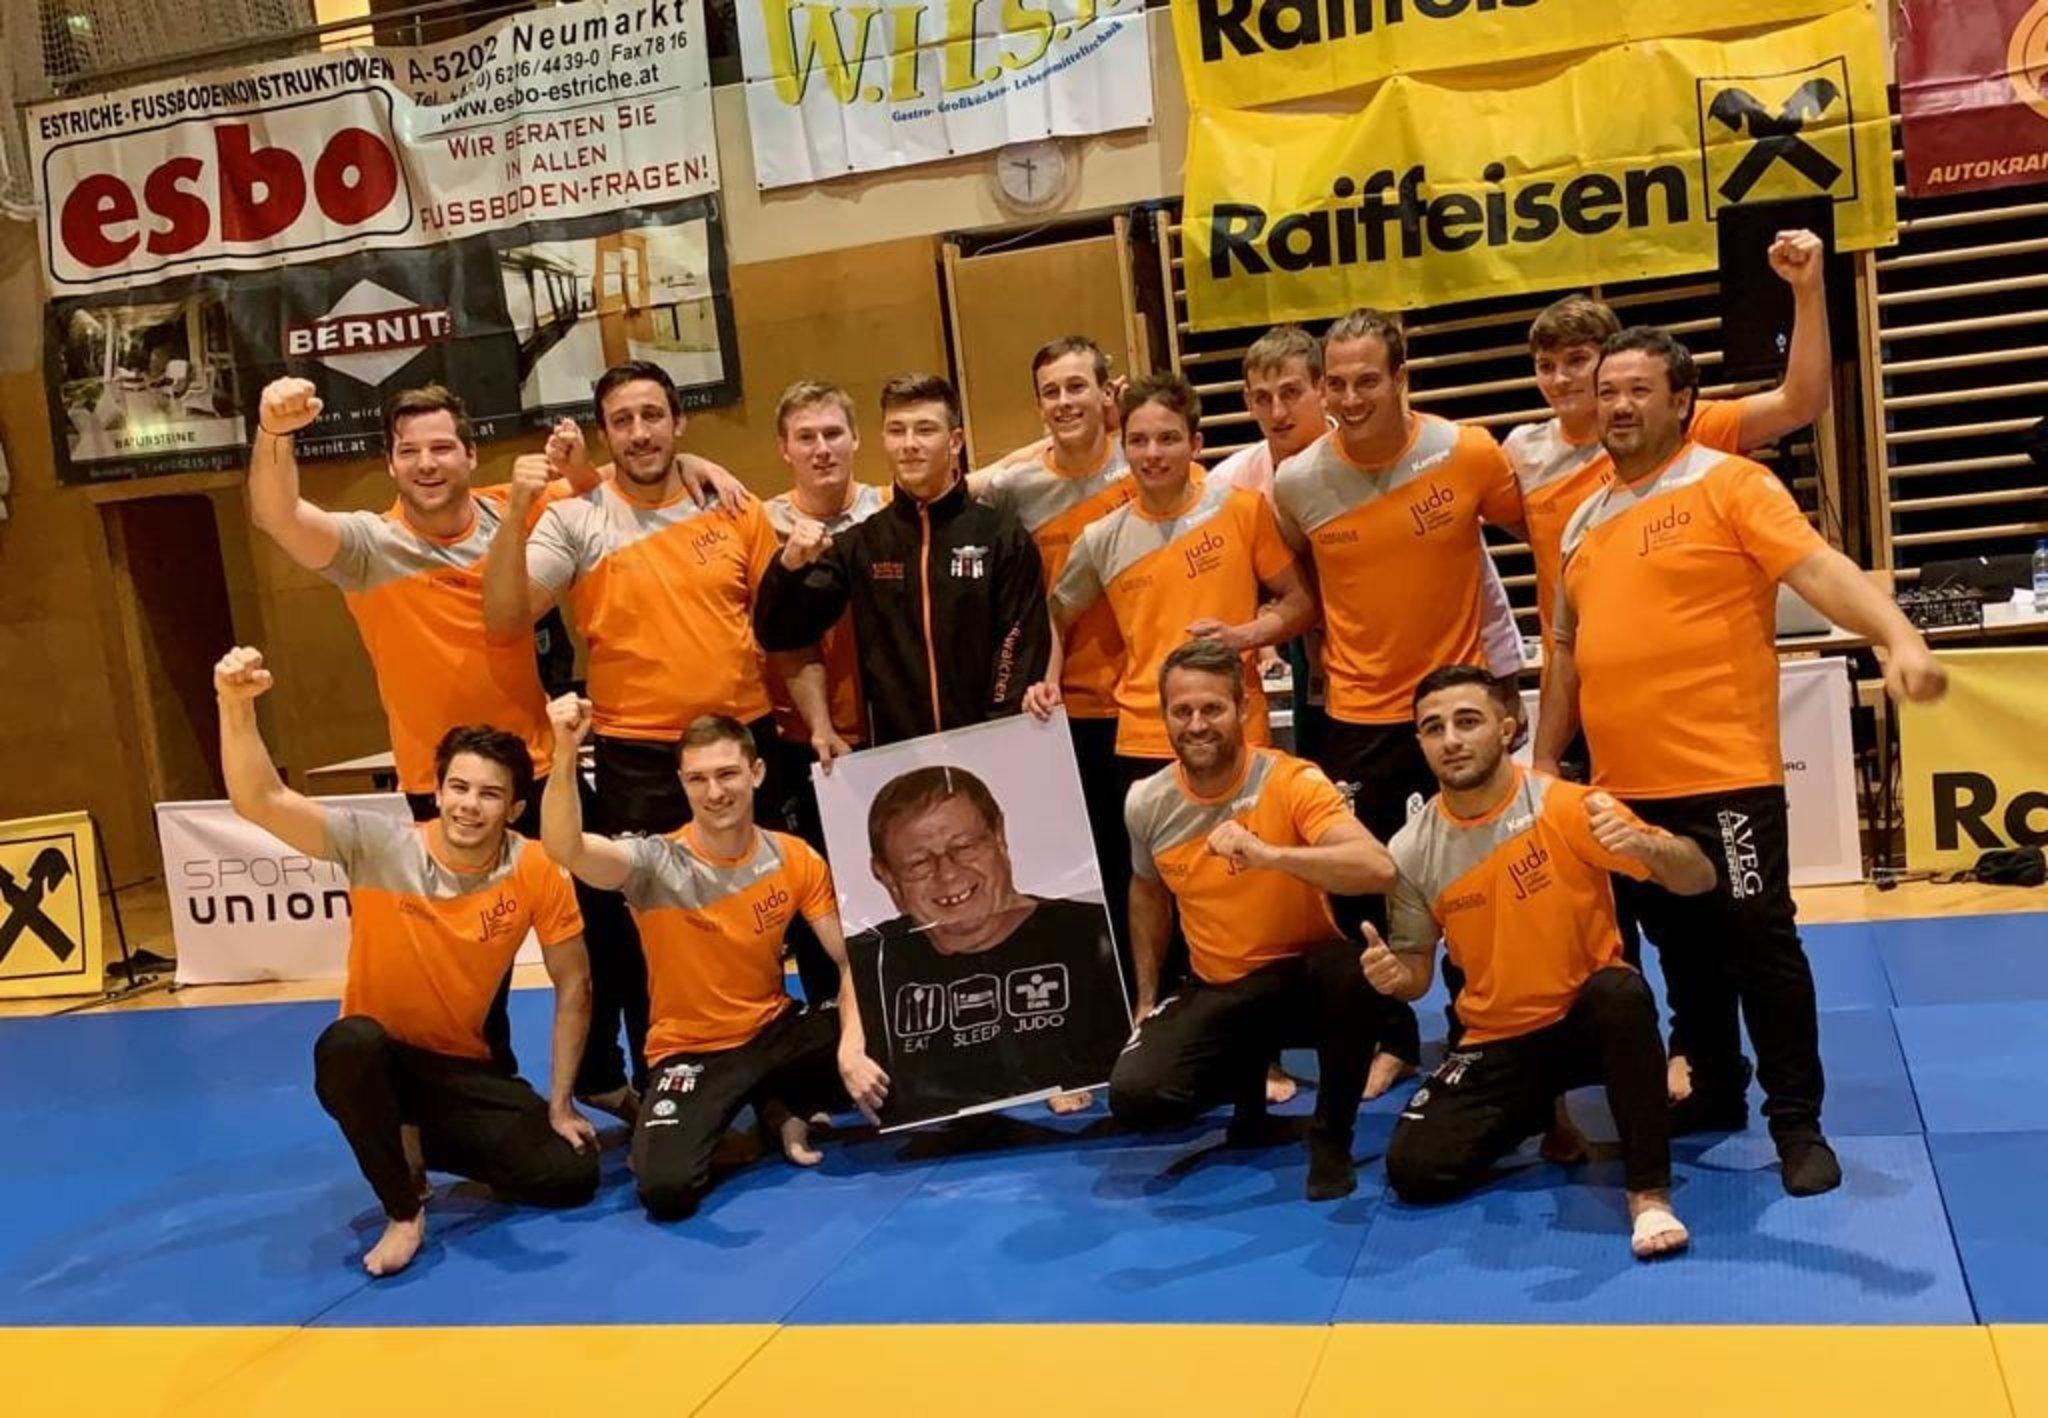 Judo Union Raiffeisen: Flachgau im Kampf um den Bundesliga-Meistertitel - Flachgau - meinbezirk.at